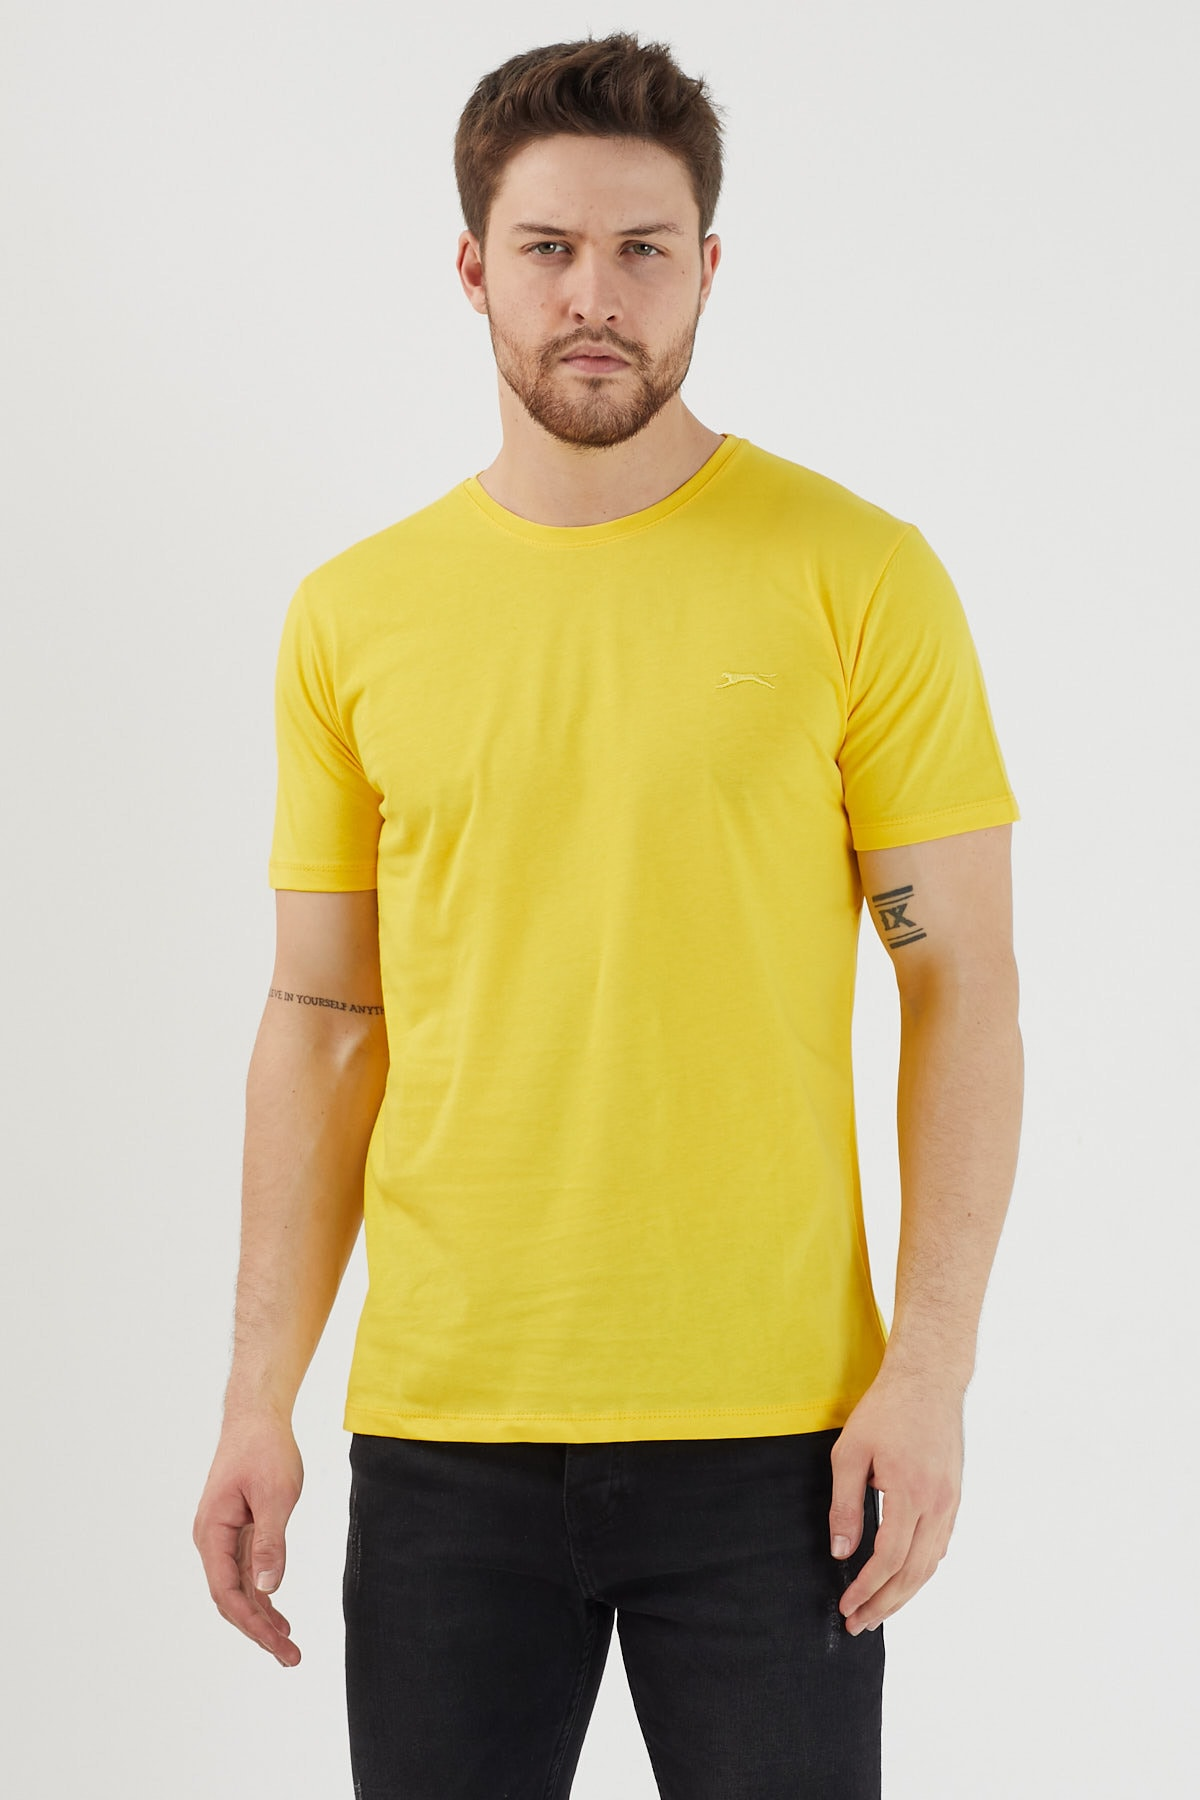 Slazenger SANDER Erkek T-Shirt Sarı ST11TE083